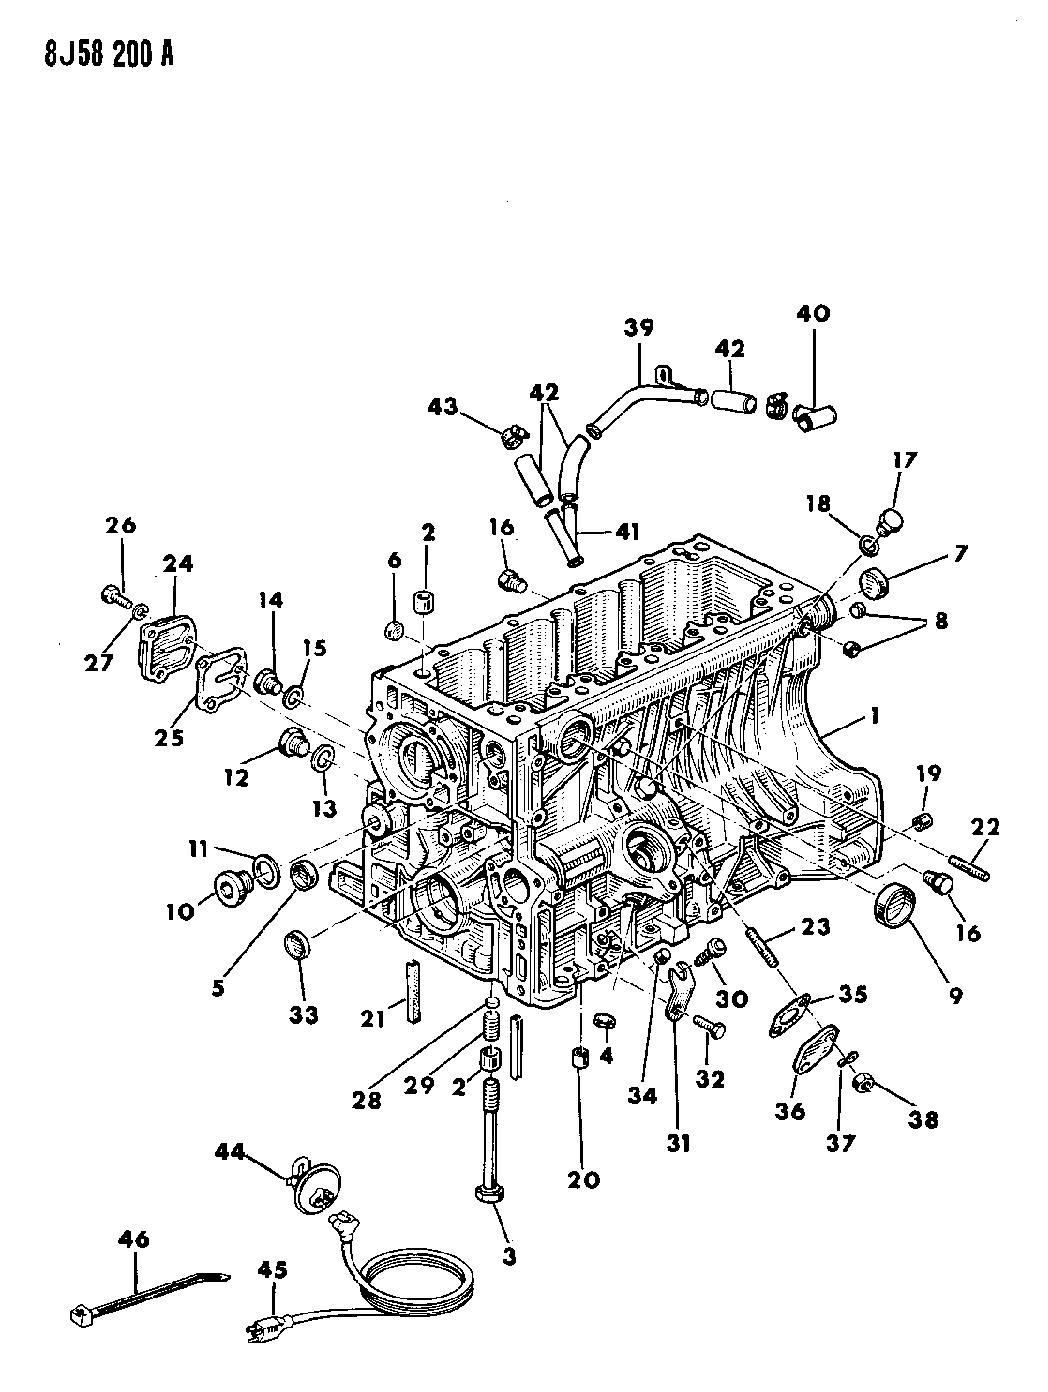 1987 Jeep Wrangler Cylinder Block Mopar Parts Giant Yj Engine Diagram Thumbnail 3